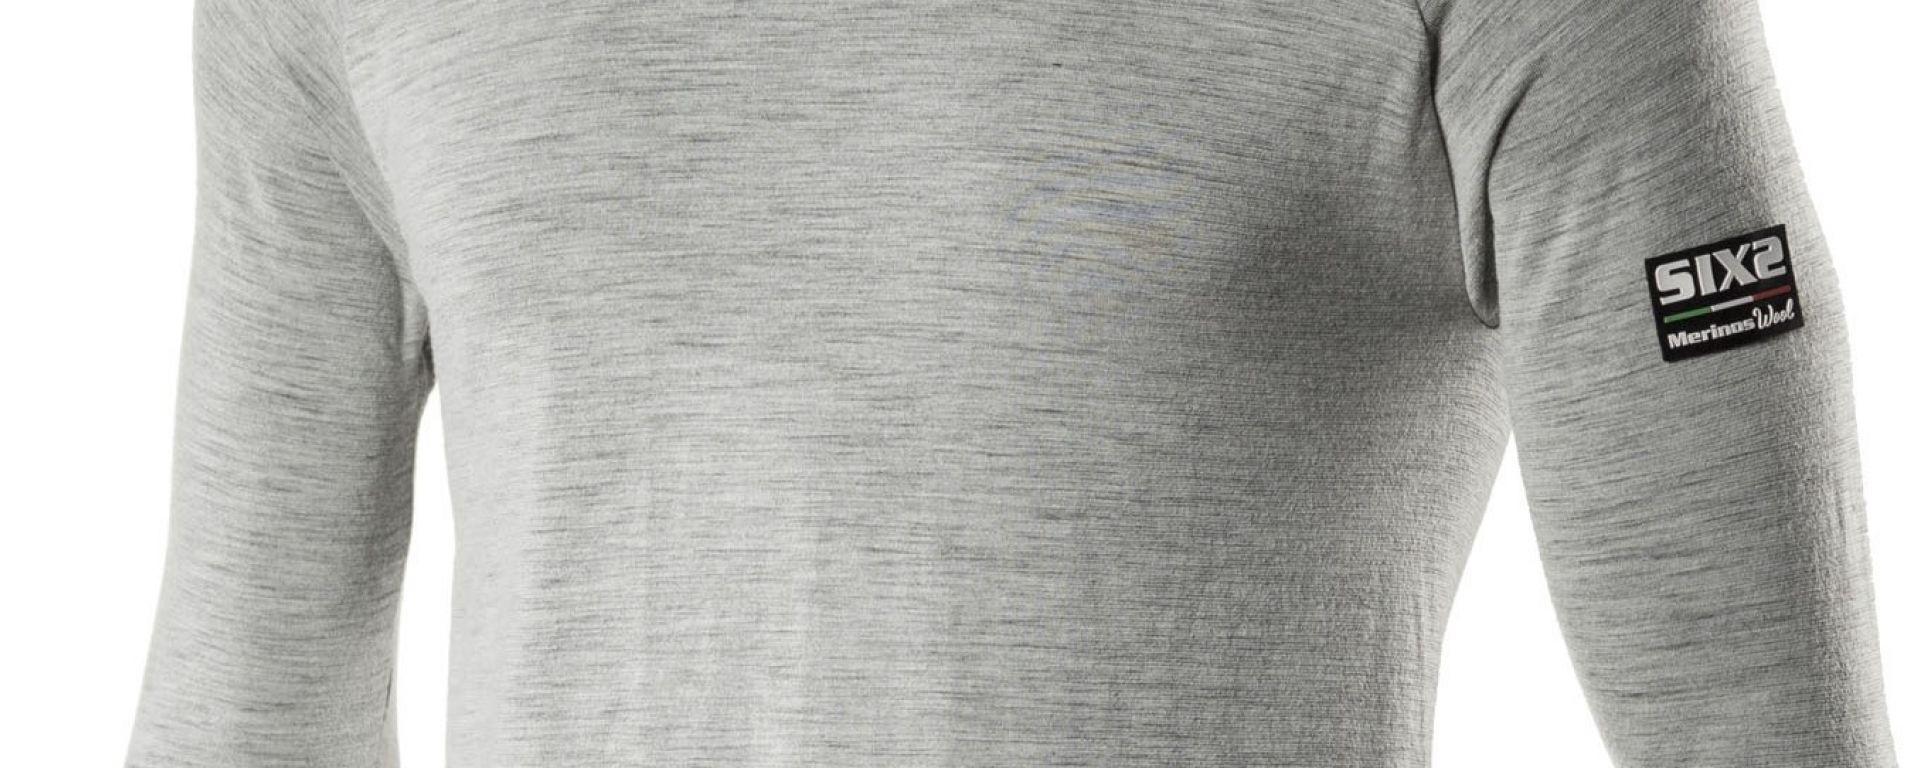 Sixs Merinos Wool